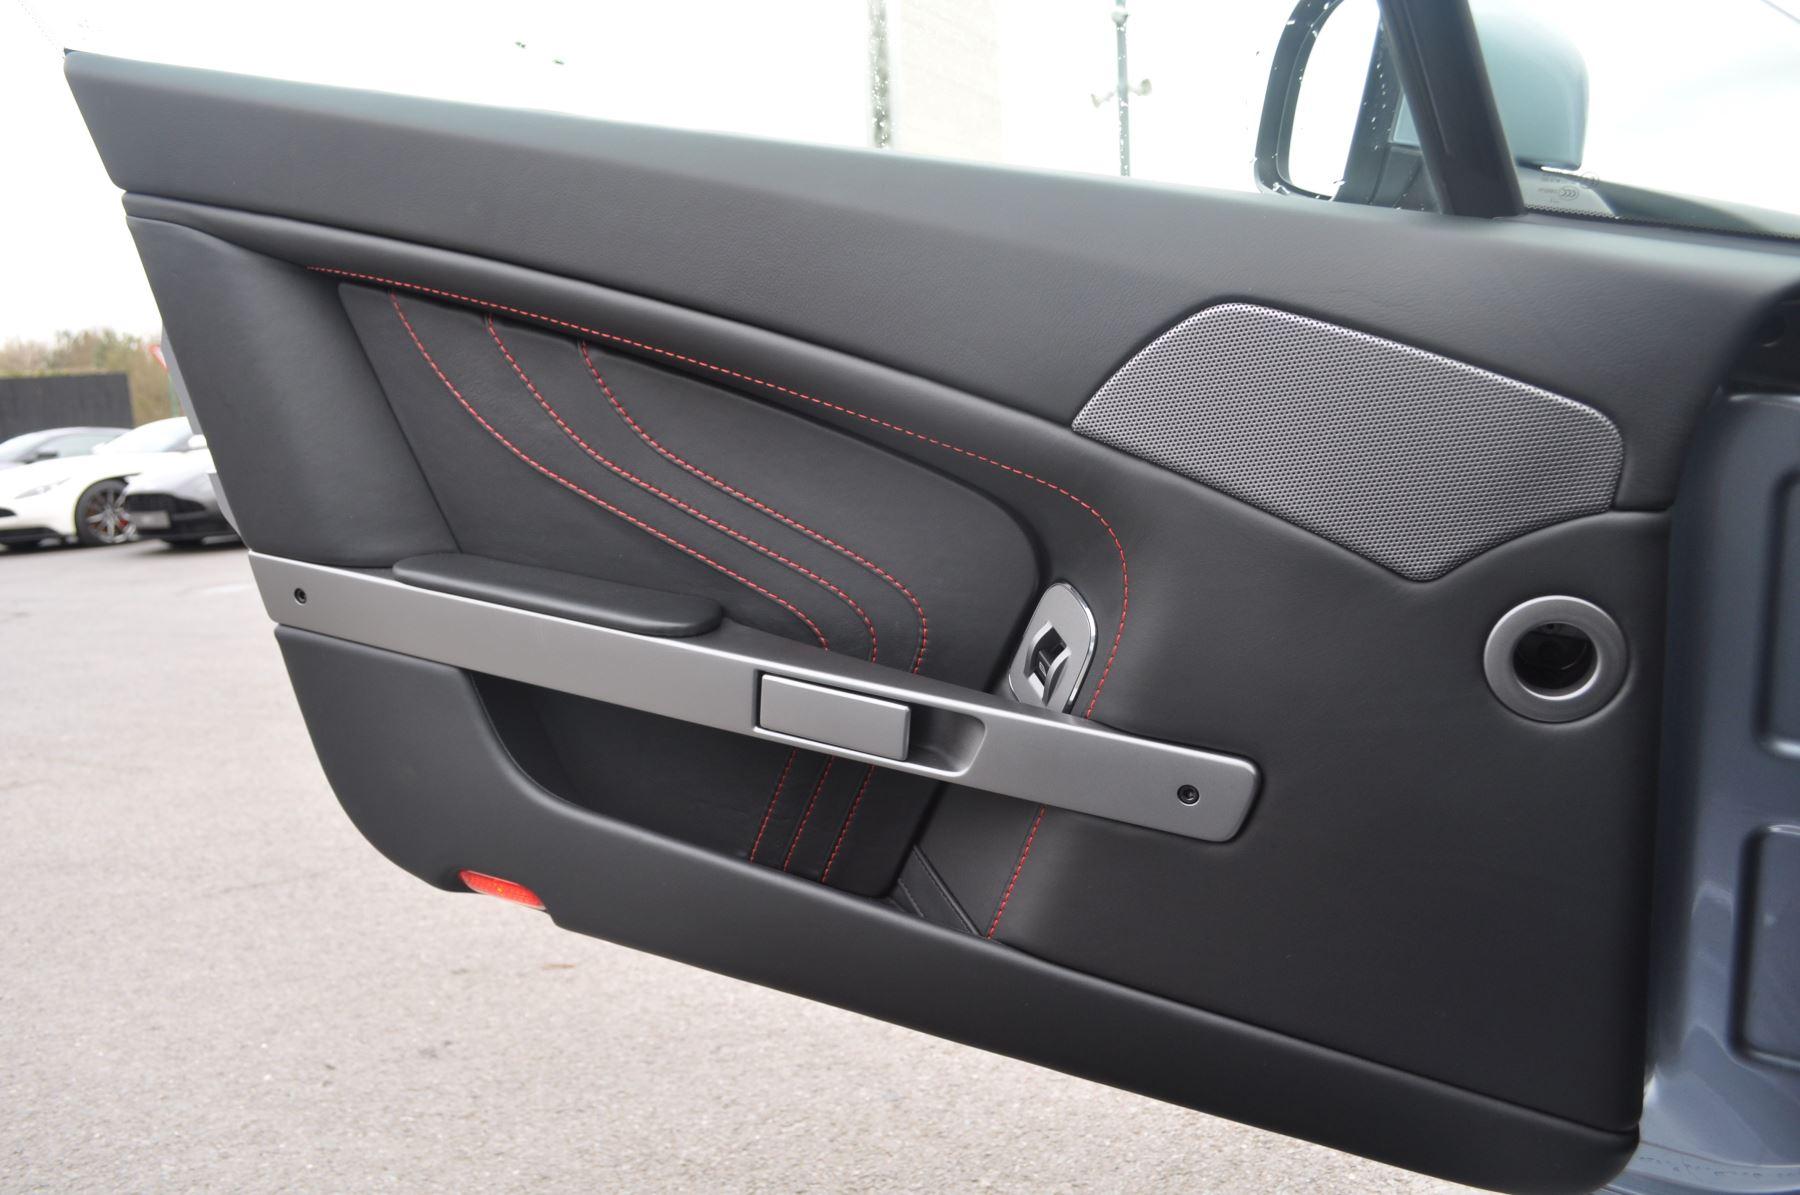 Aston Martin V8 Vantage S Coupe Coupe image 31